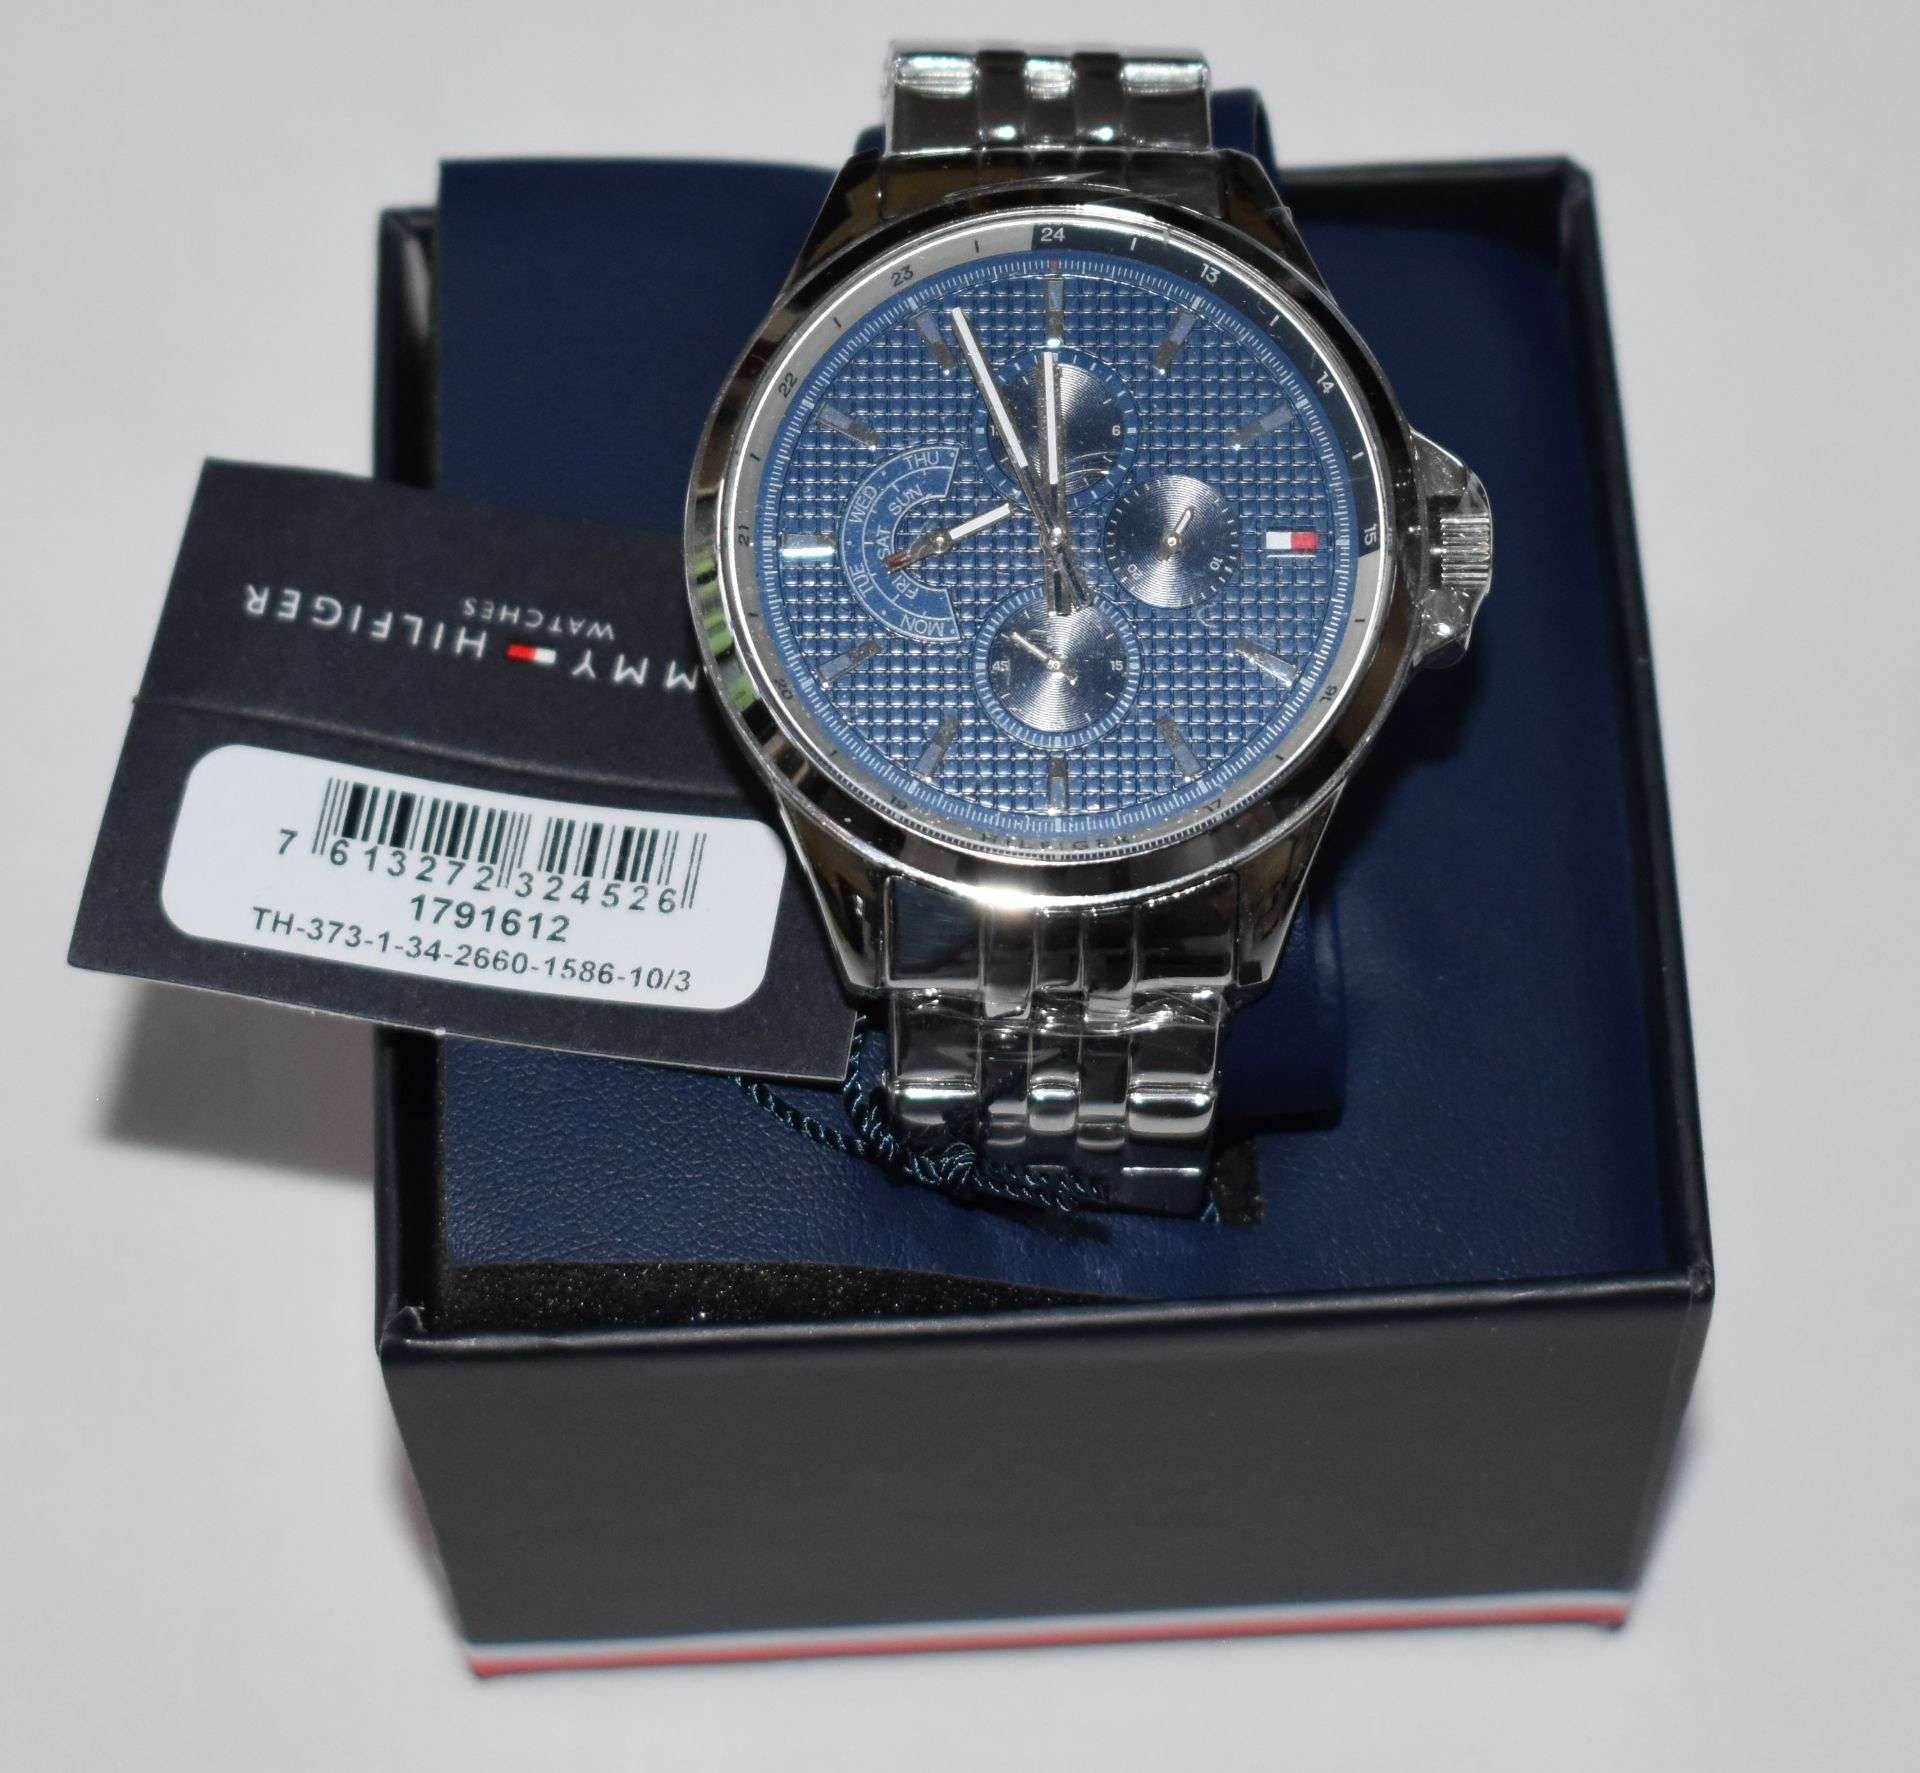 Tommy Hilfiger Men's Watch 1791612 - Image 2 of 2